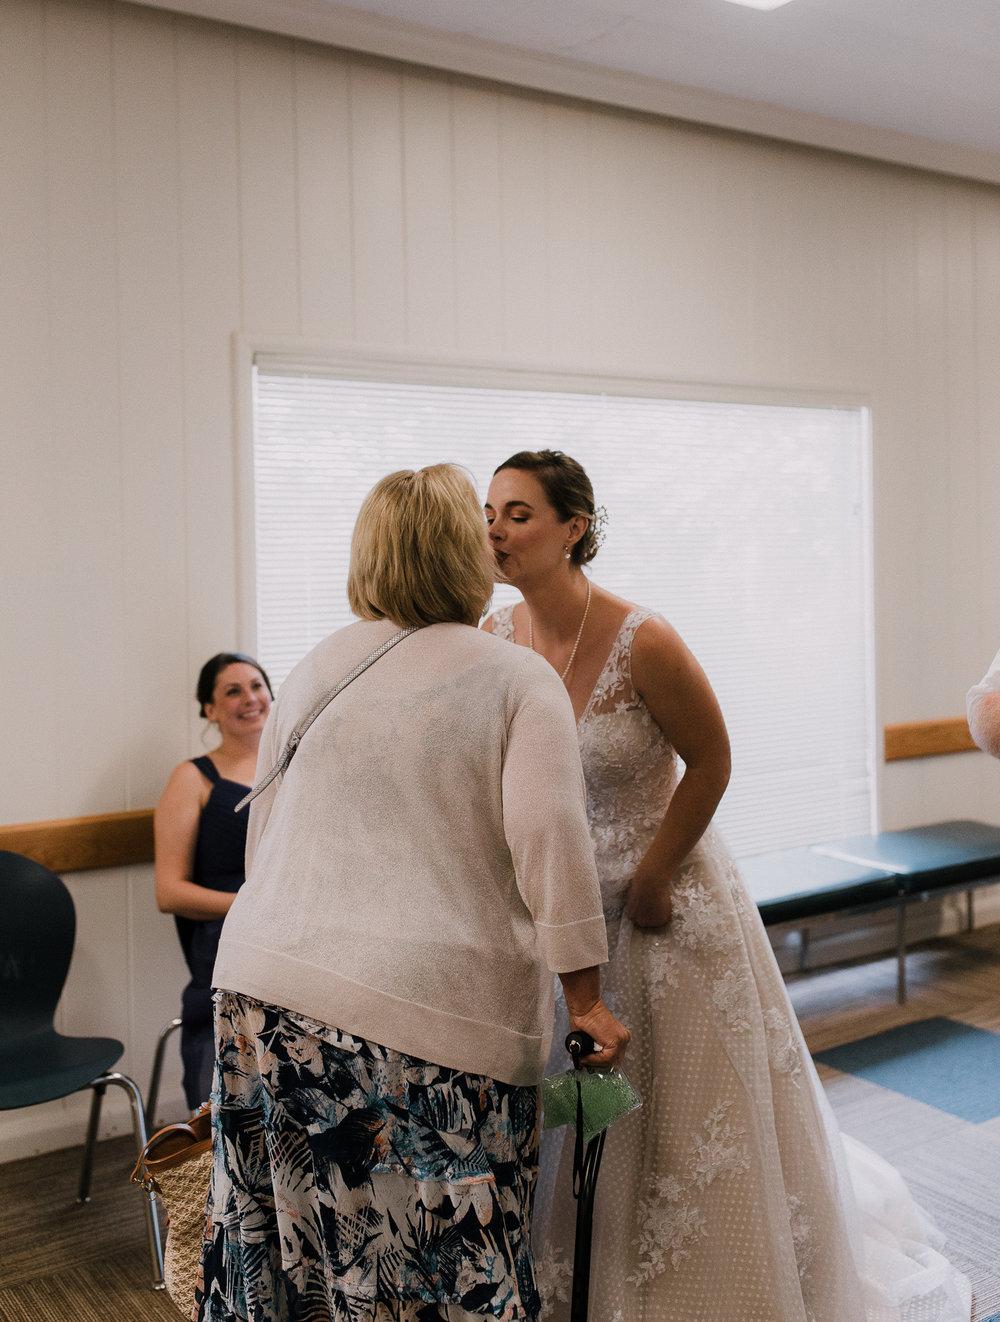 sheffwedding-109.JPG